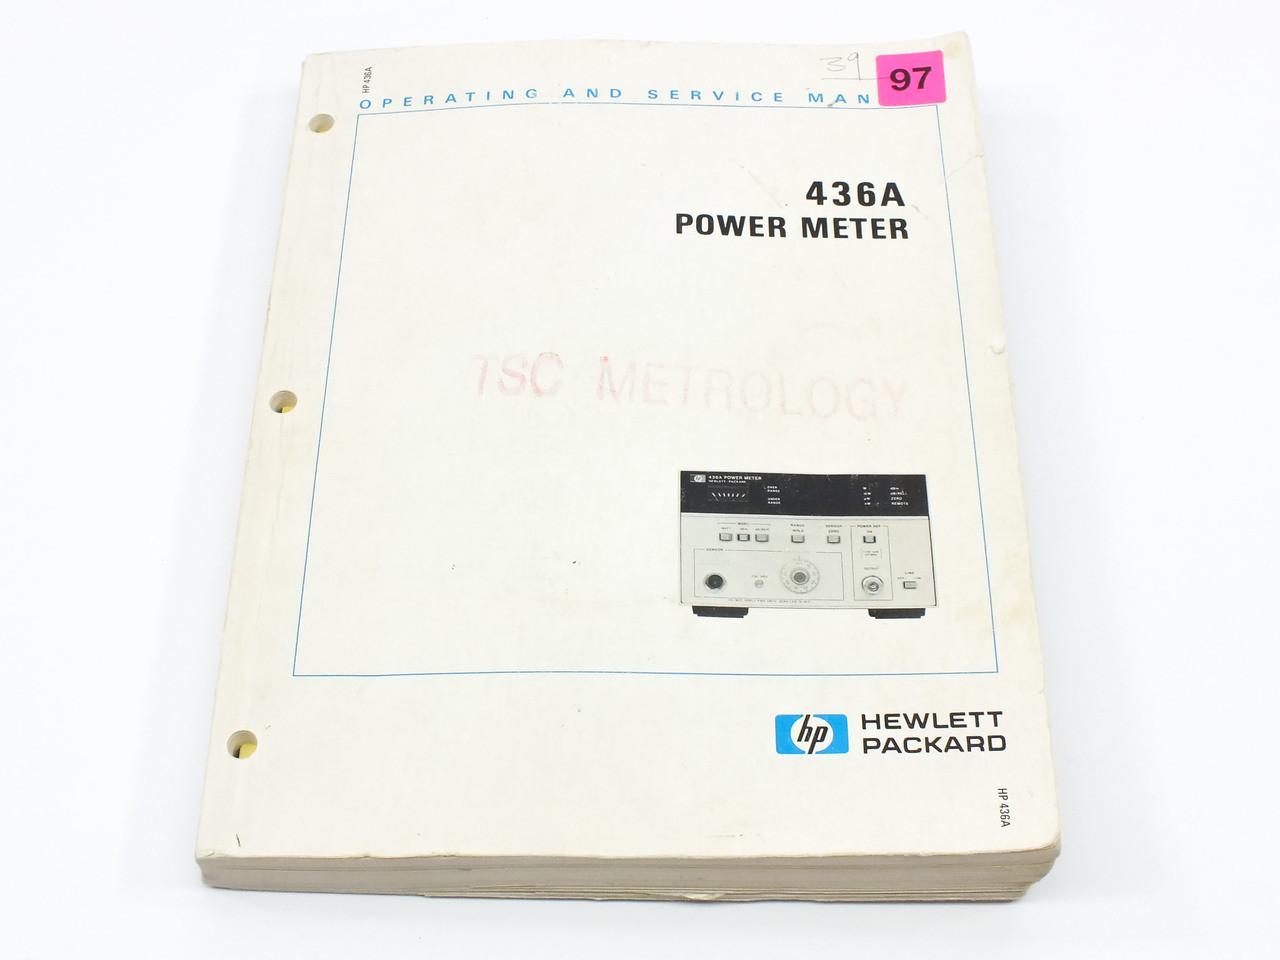 Hp 436a power meter operating and service manual recycledgoods hp 436a power meter operating and service manual freerunsca Choice Image